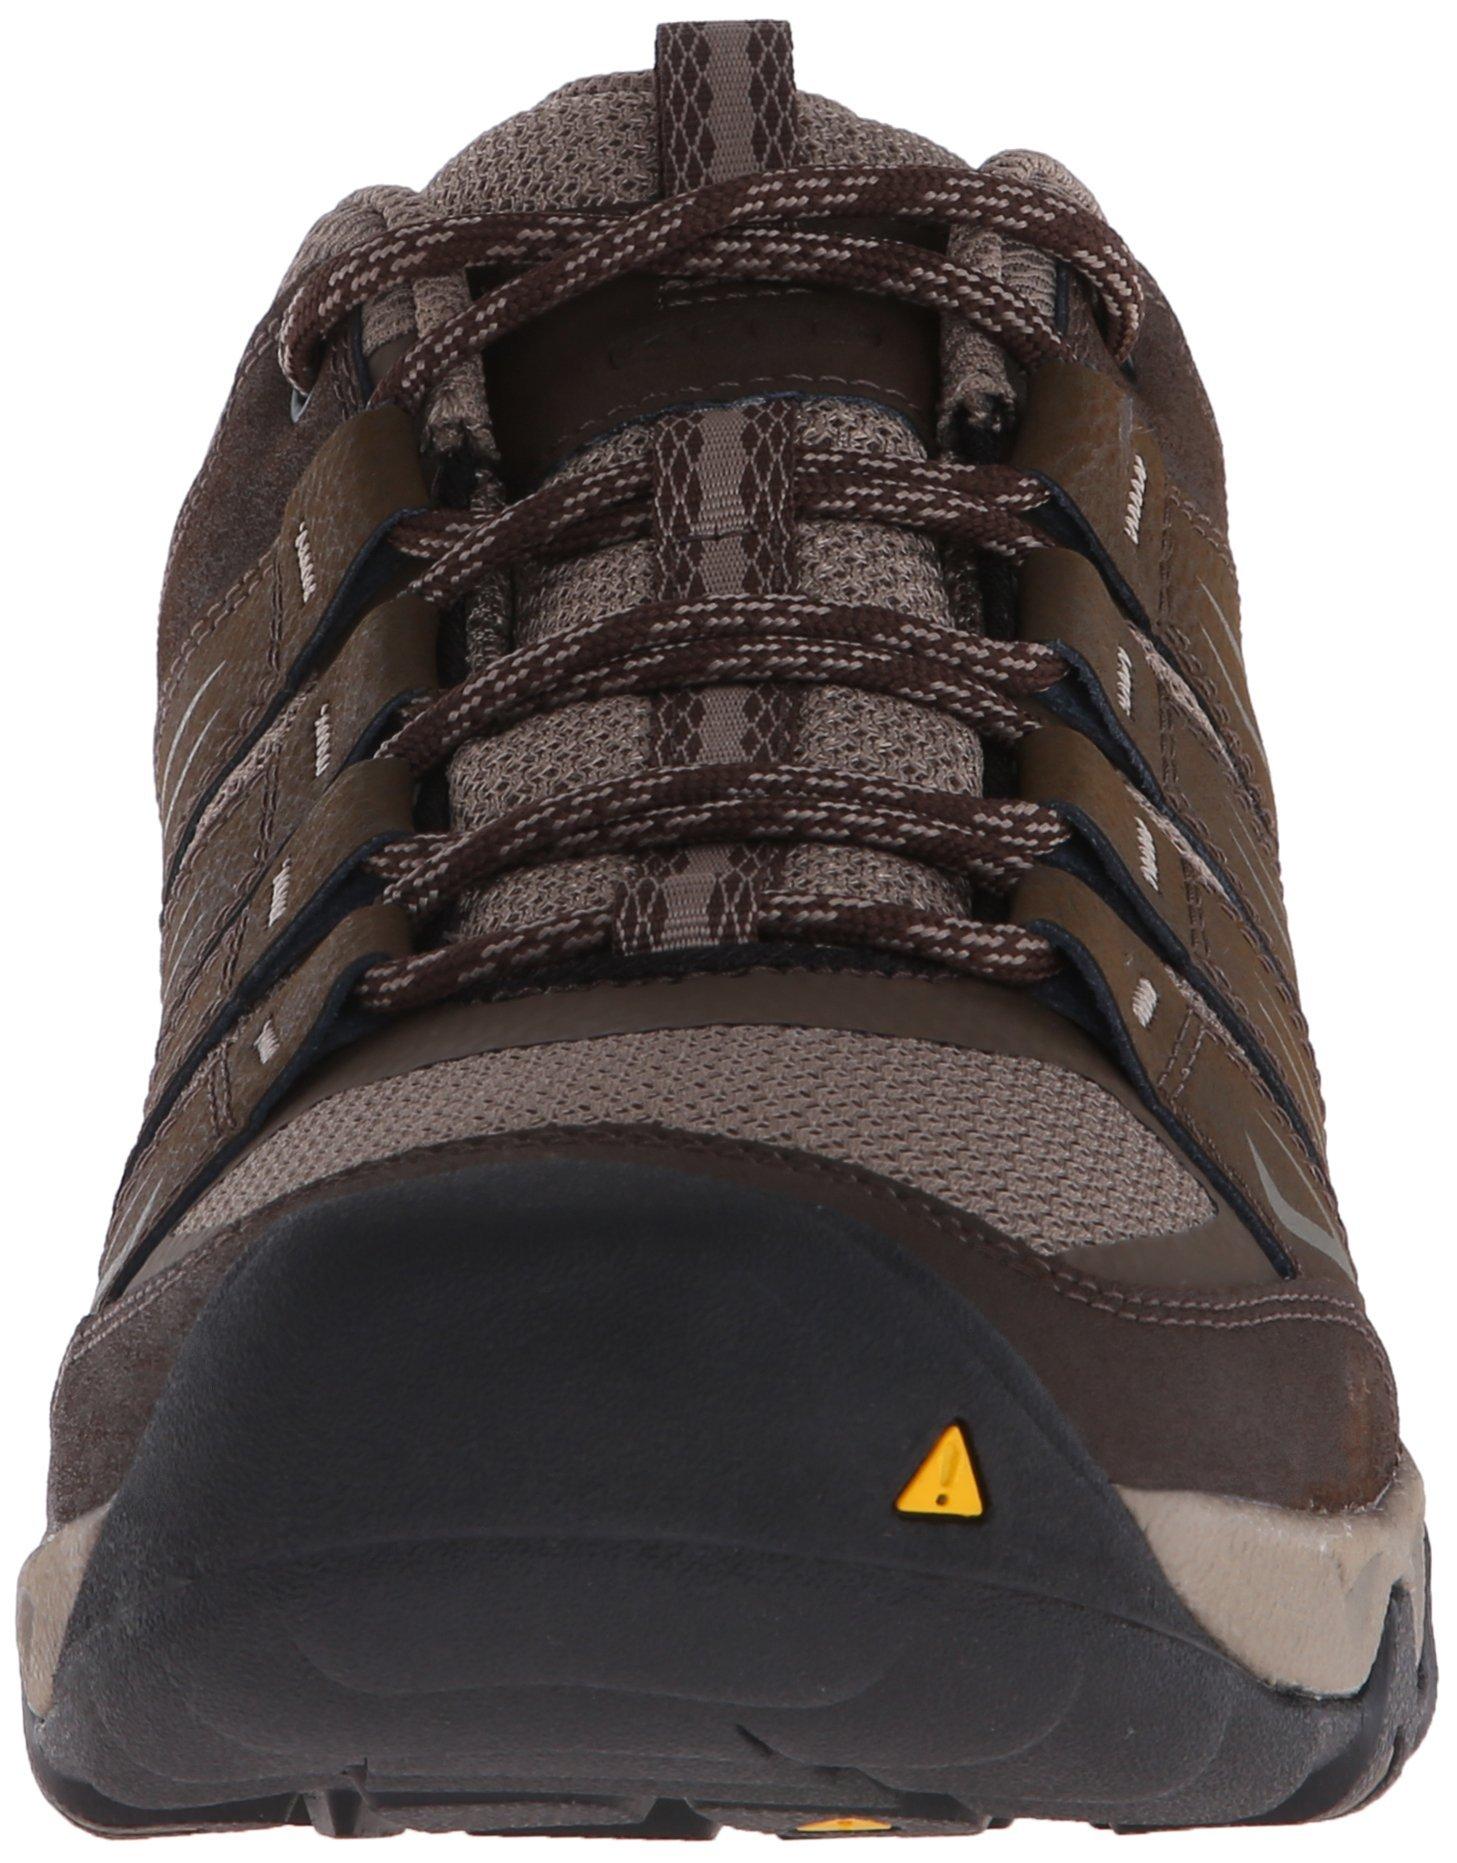 Keen Men's Oakridge Hiking Shoe